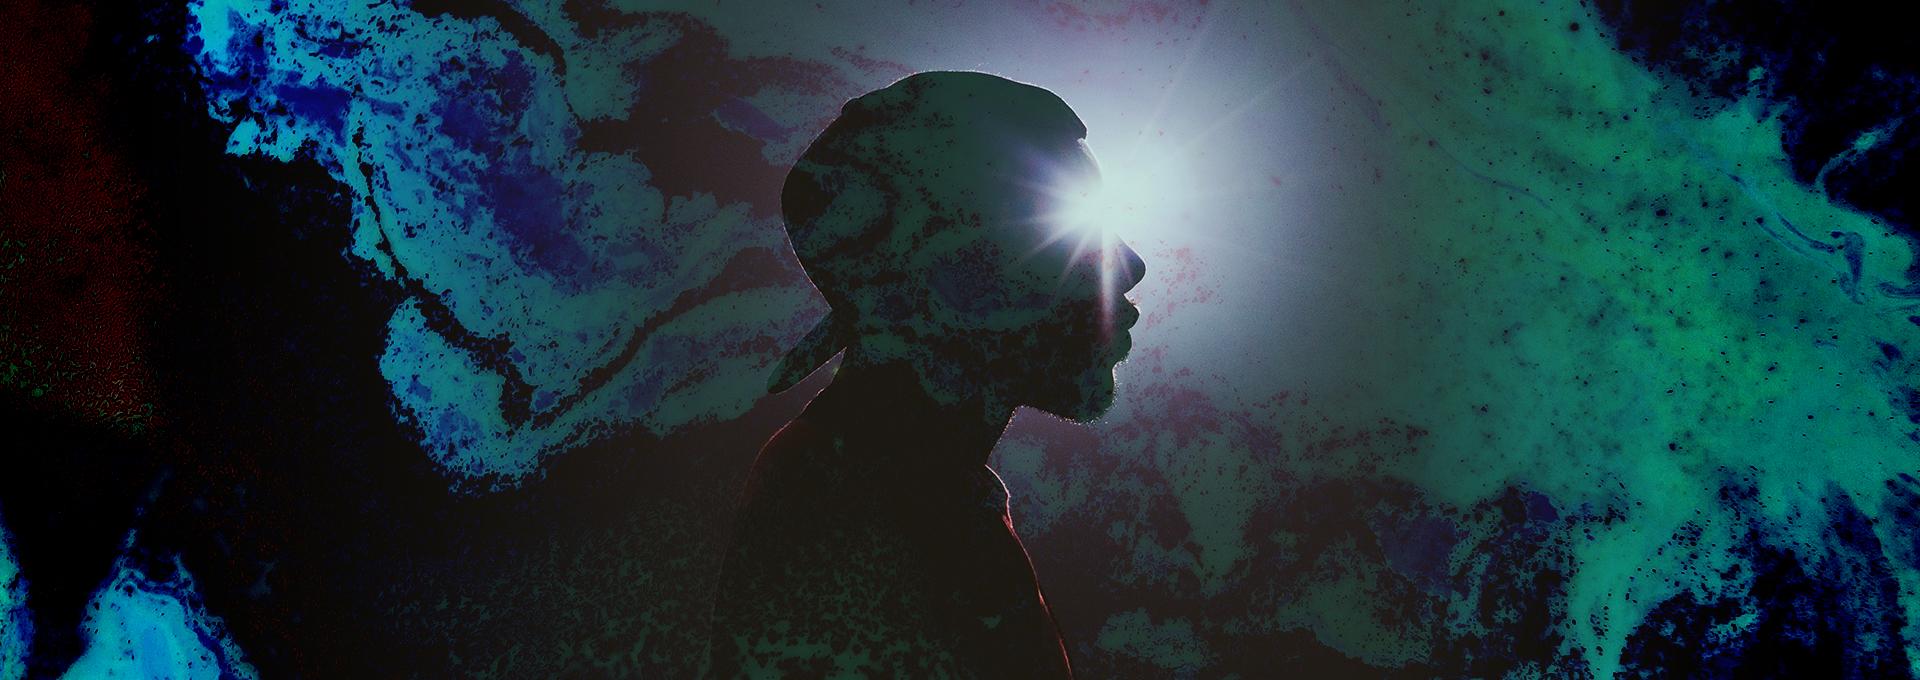 D Rebound 99本月饒舌推薦 (2020 /02)